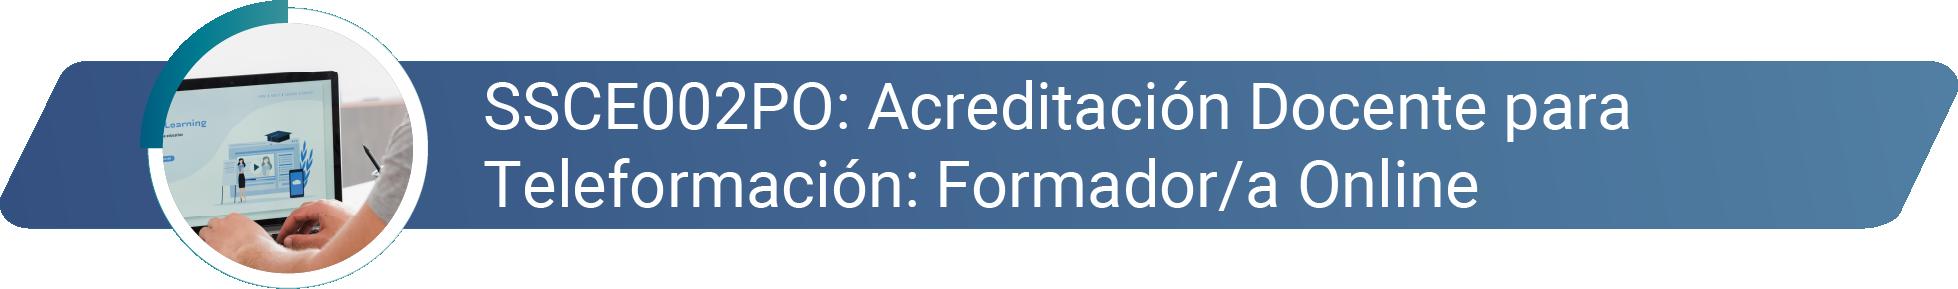 acreditacion_docente_banner